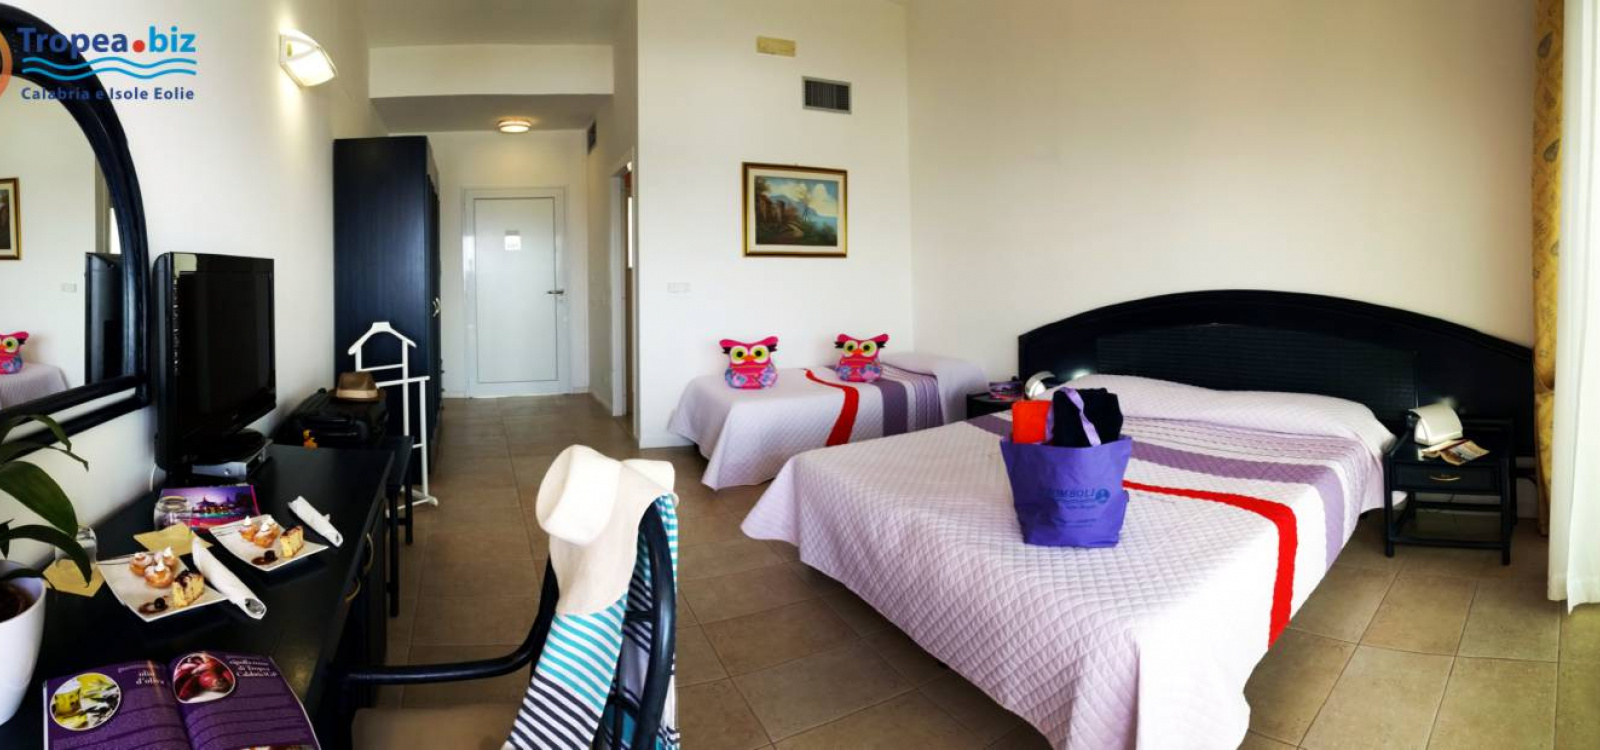 Camera Hotel Stromboli